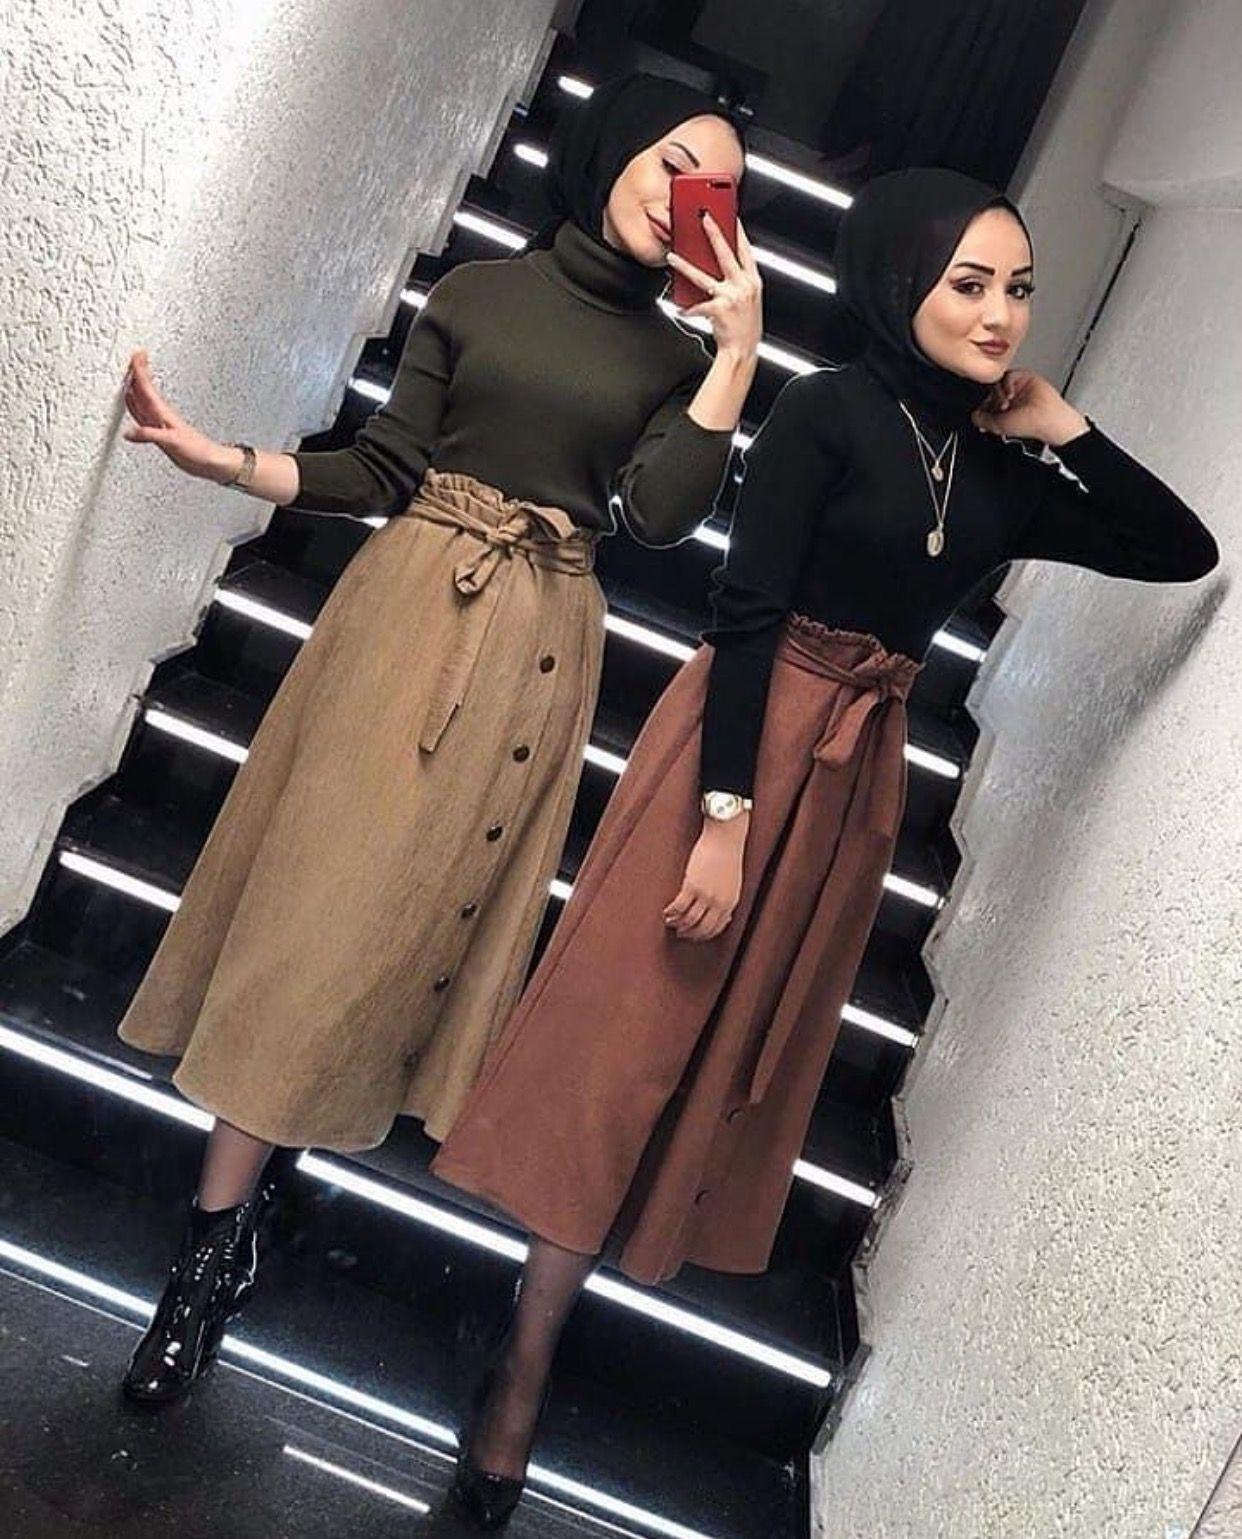 hijabi #hijabdaily #hijabstyle #hijabinspiration #muslim #hijaber